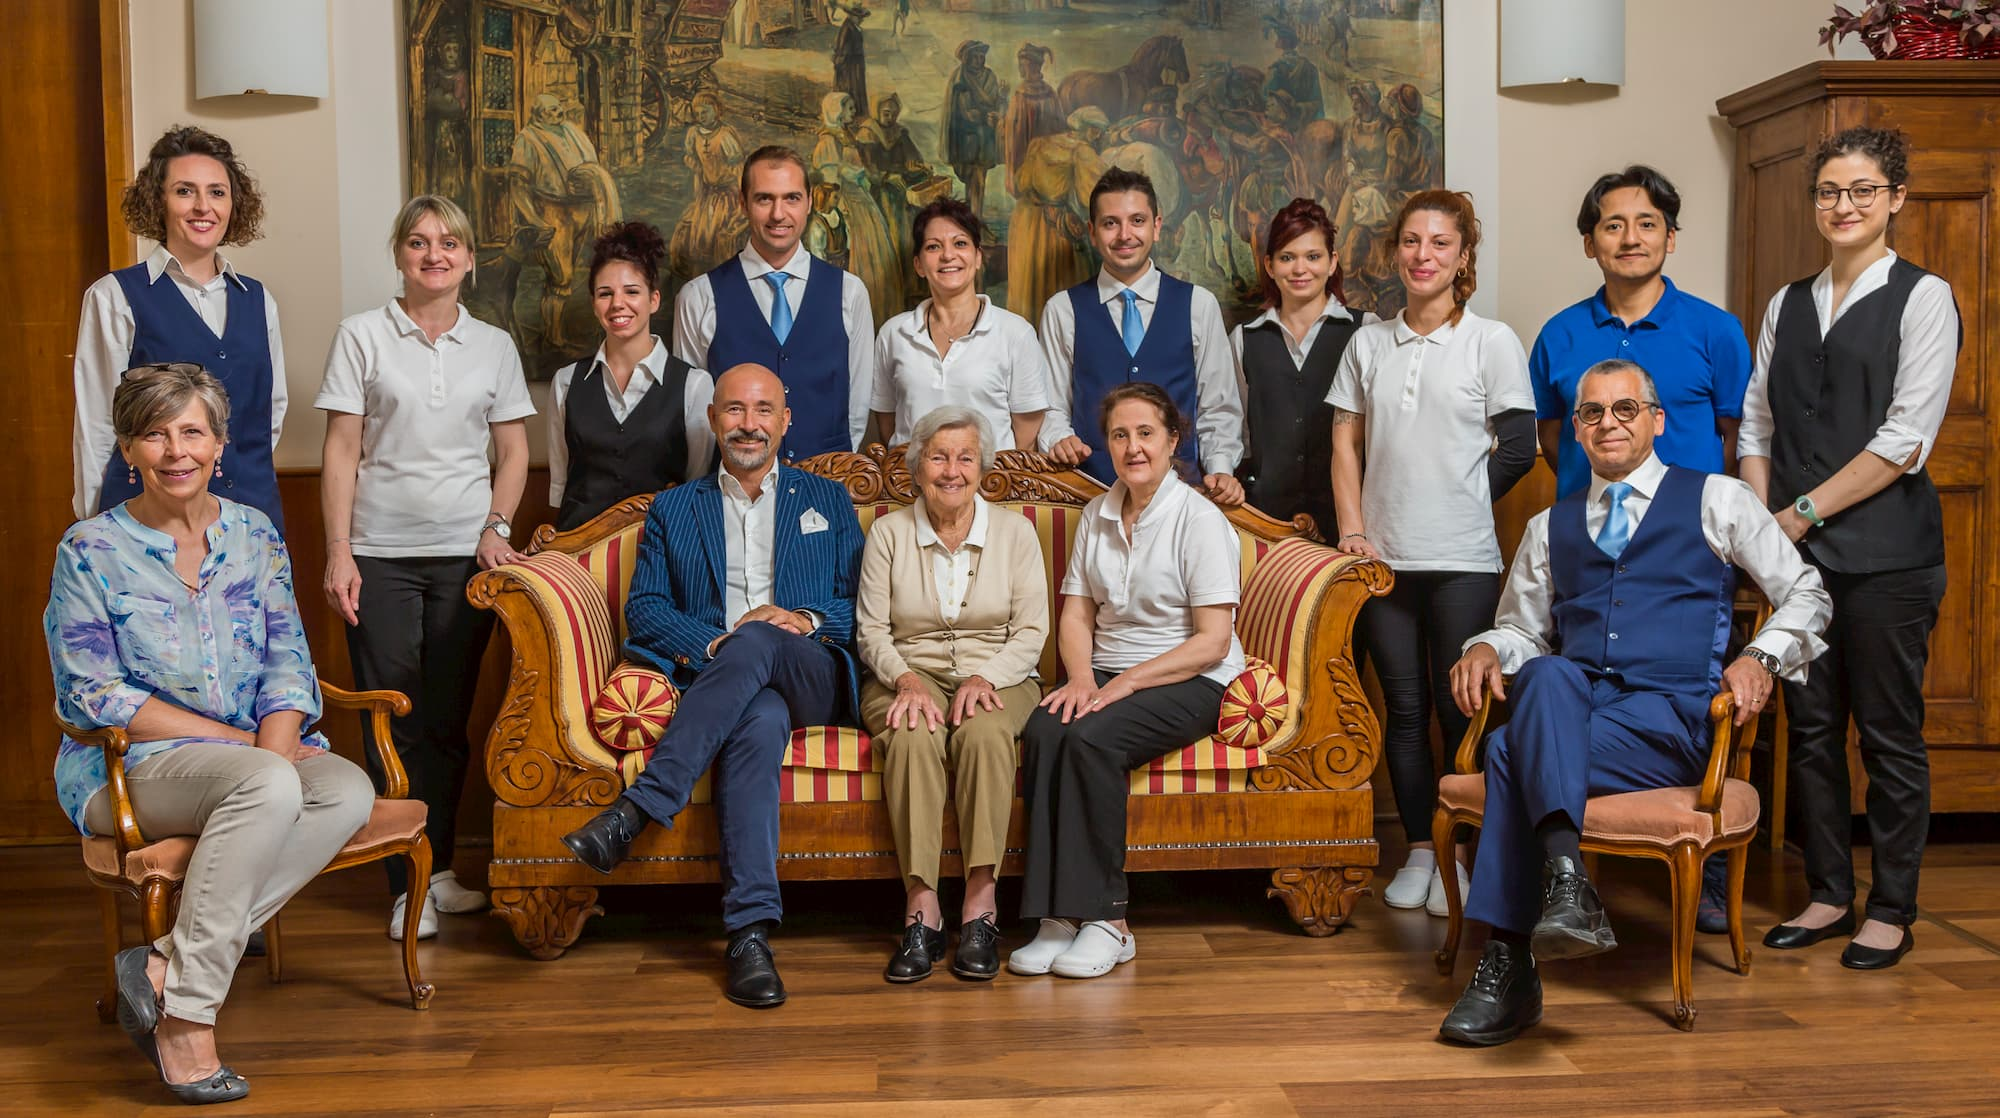 Hotel Roma staff picture